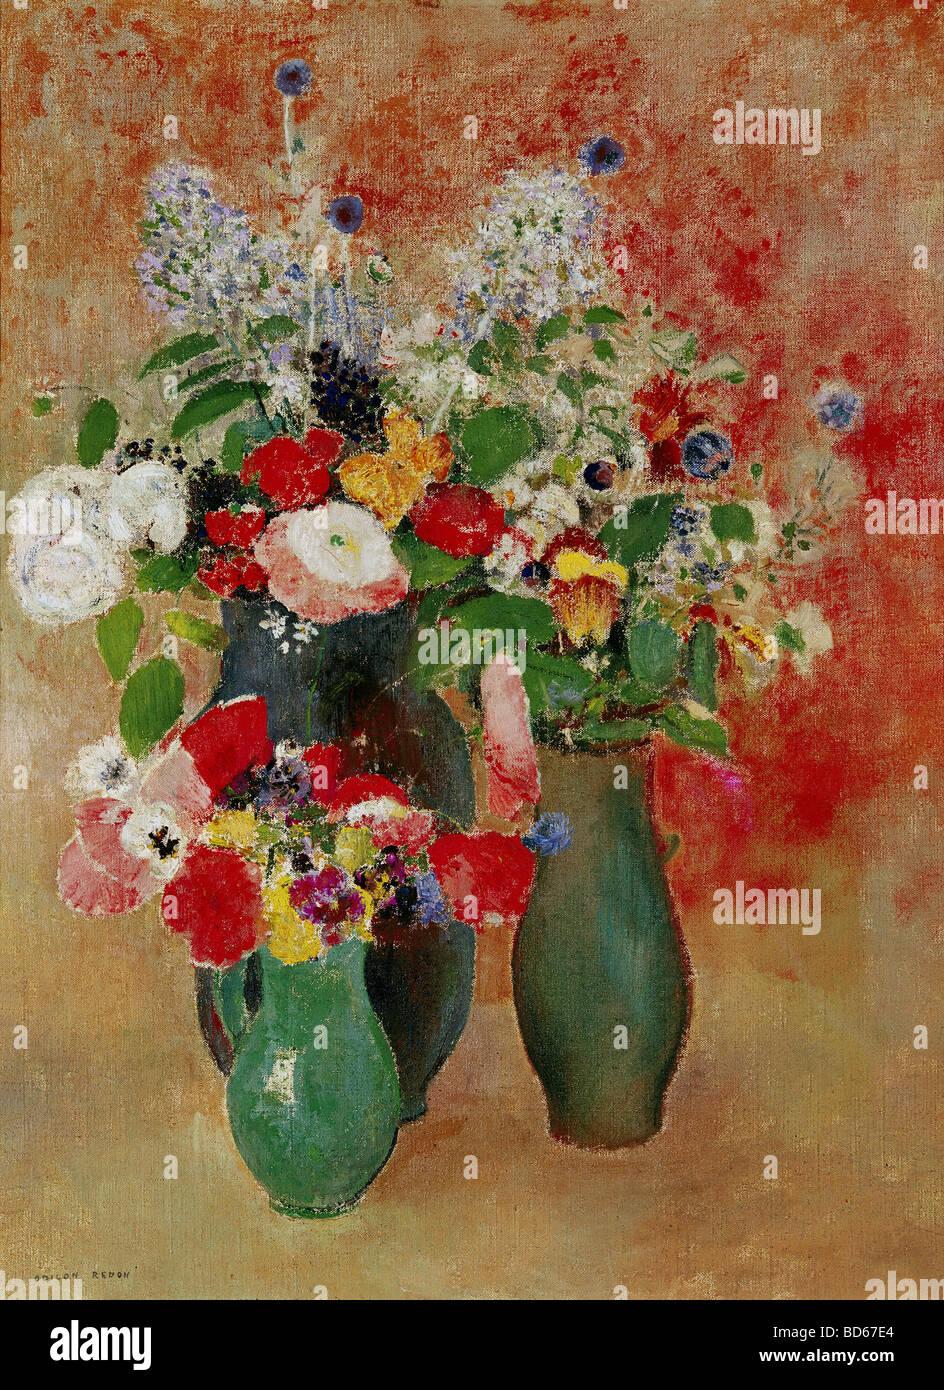 Bellas artes, Redon, Odilon, (22.4.1840 - 6.7.1916), pintura, 'flores bodegón', Von der Heydt-Museum de Wuppertal,Foto de stock